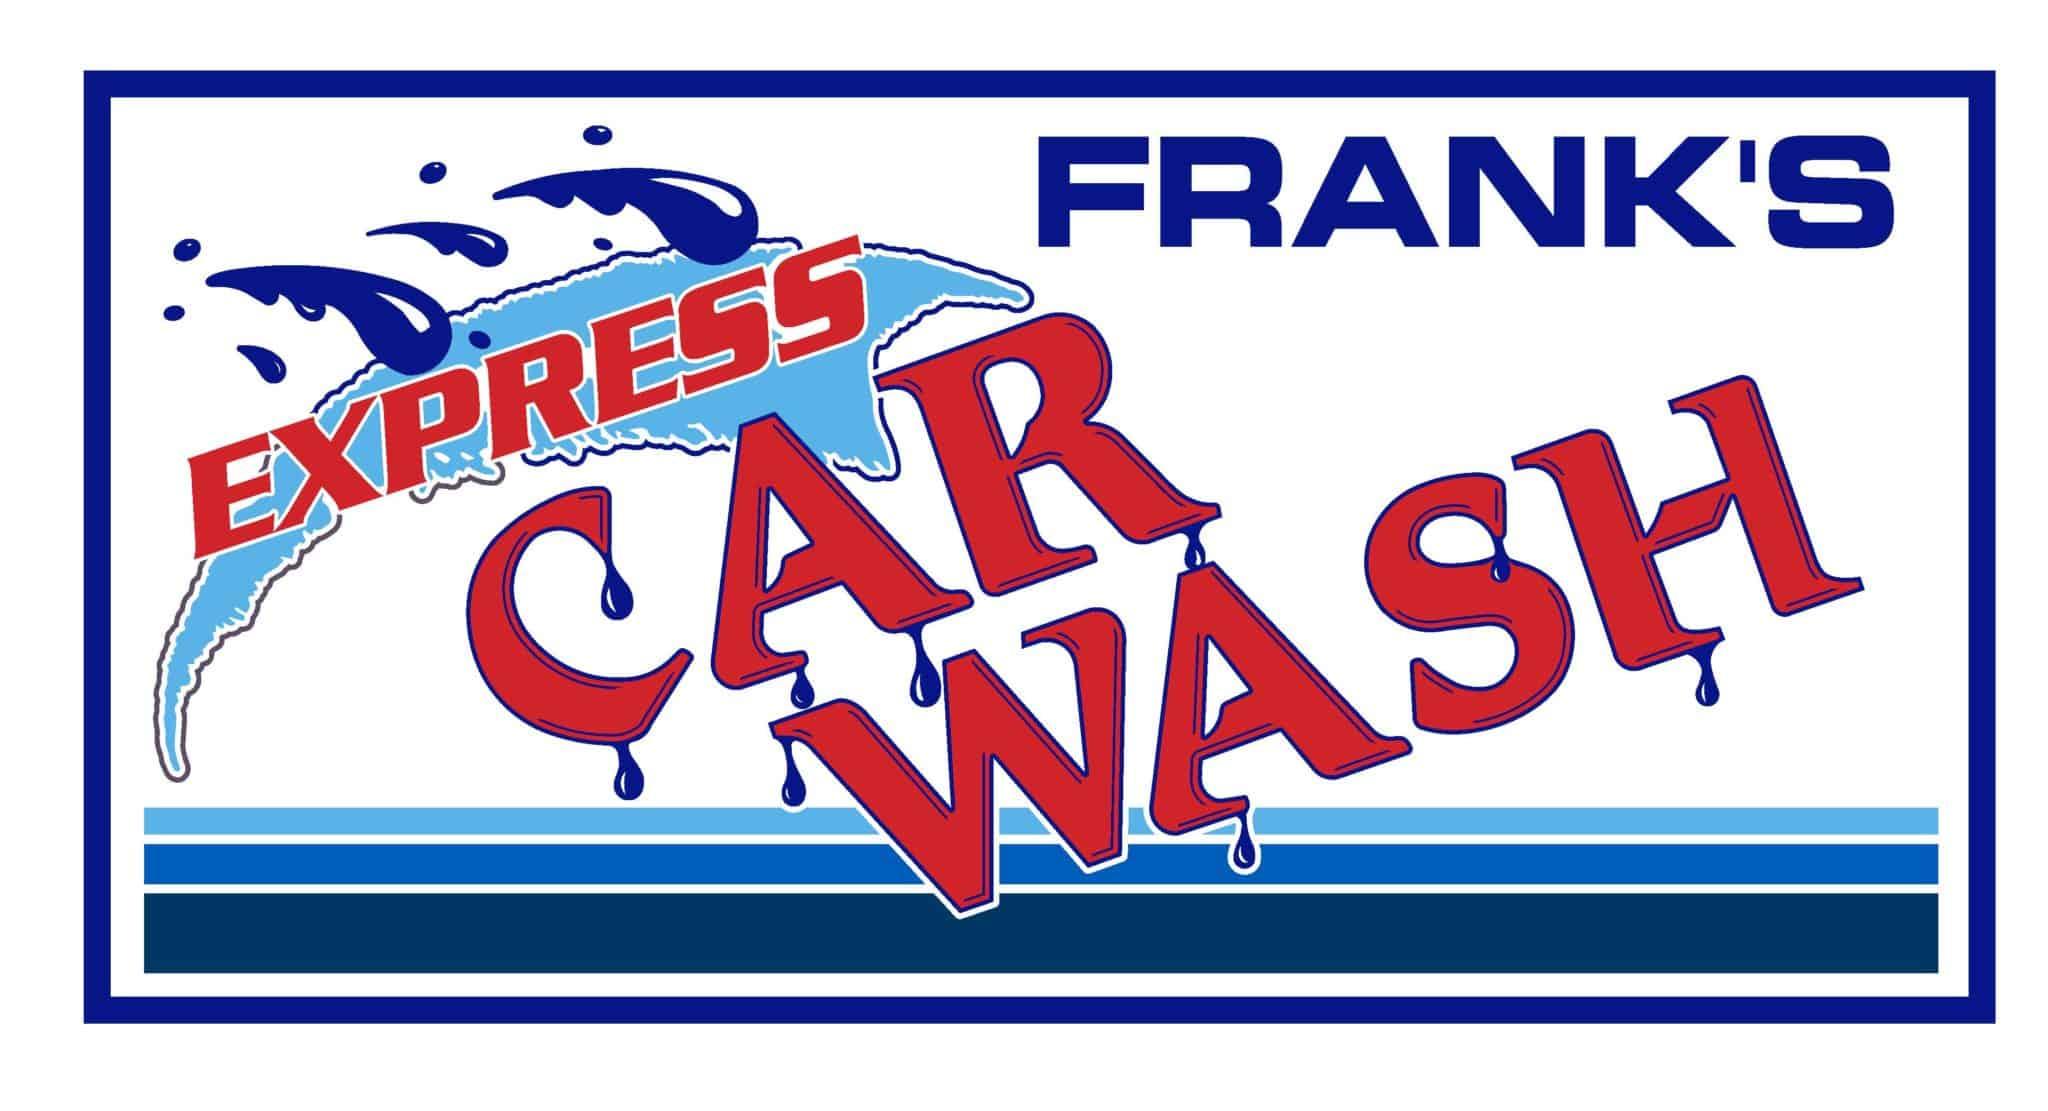 Frank's Express Car Wash